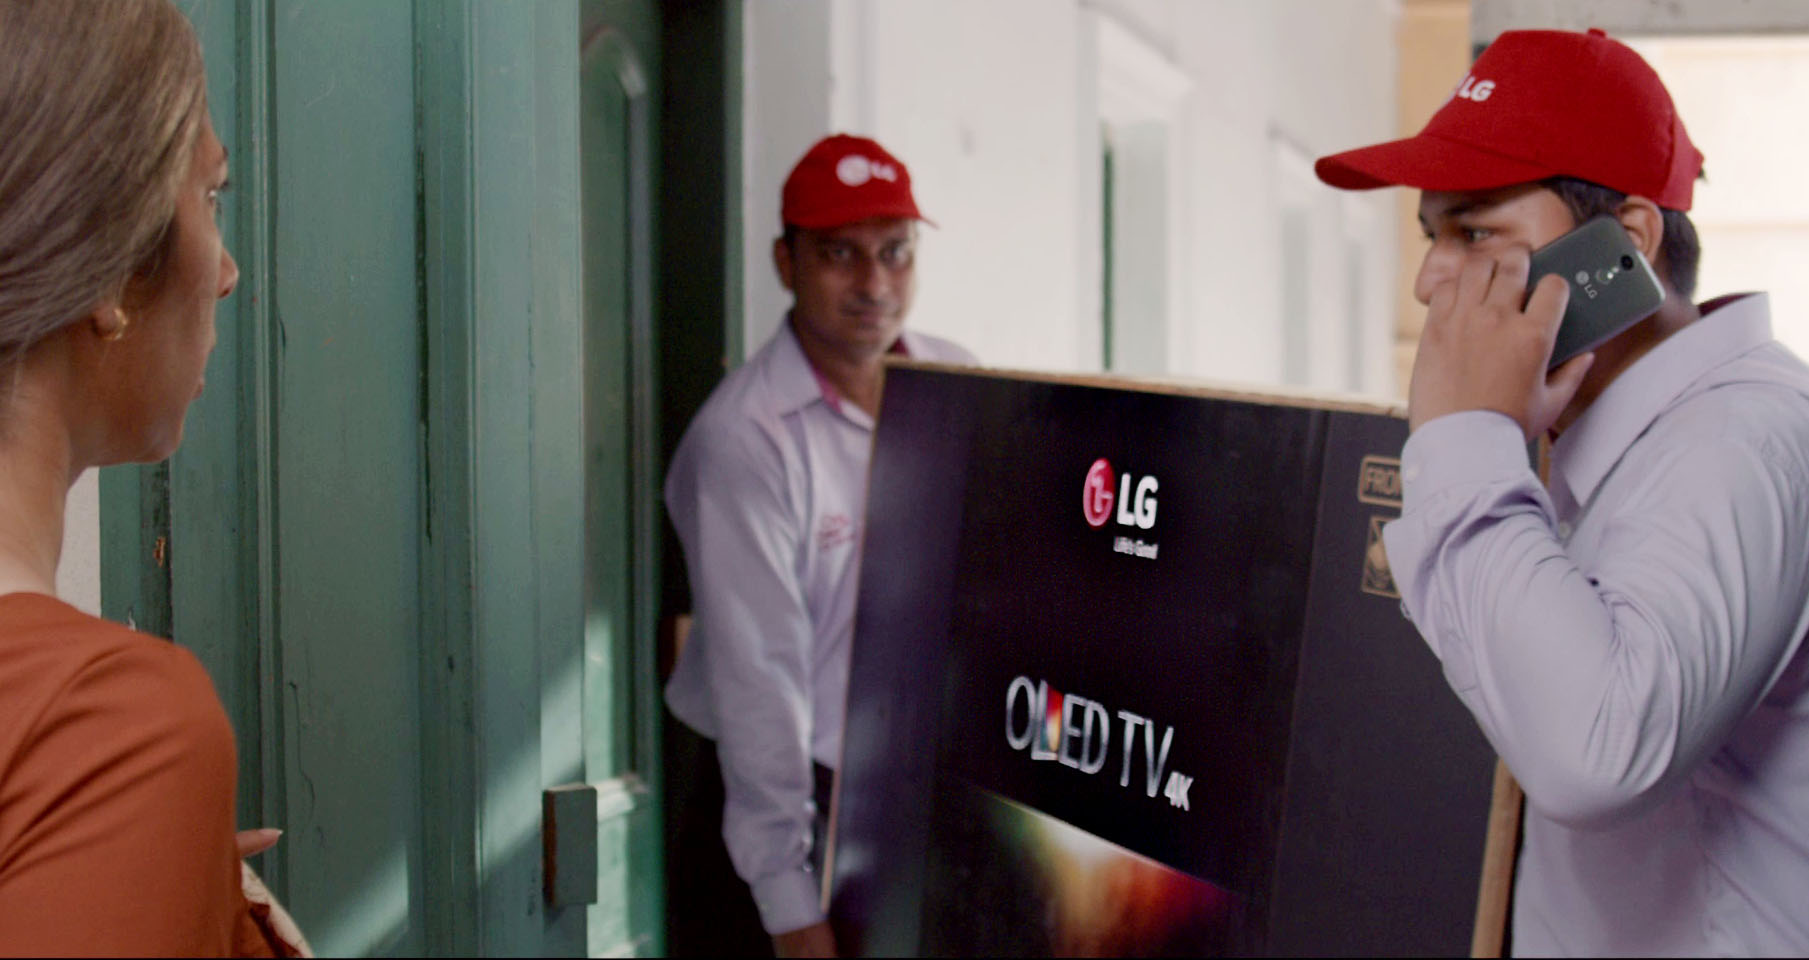 LG전자 인도 진출 20주년 기념 영상, 구글이 선정한 광고 캠페인 1위 영예